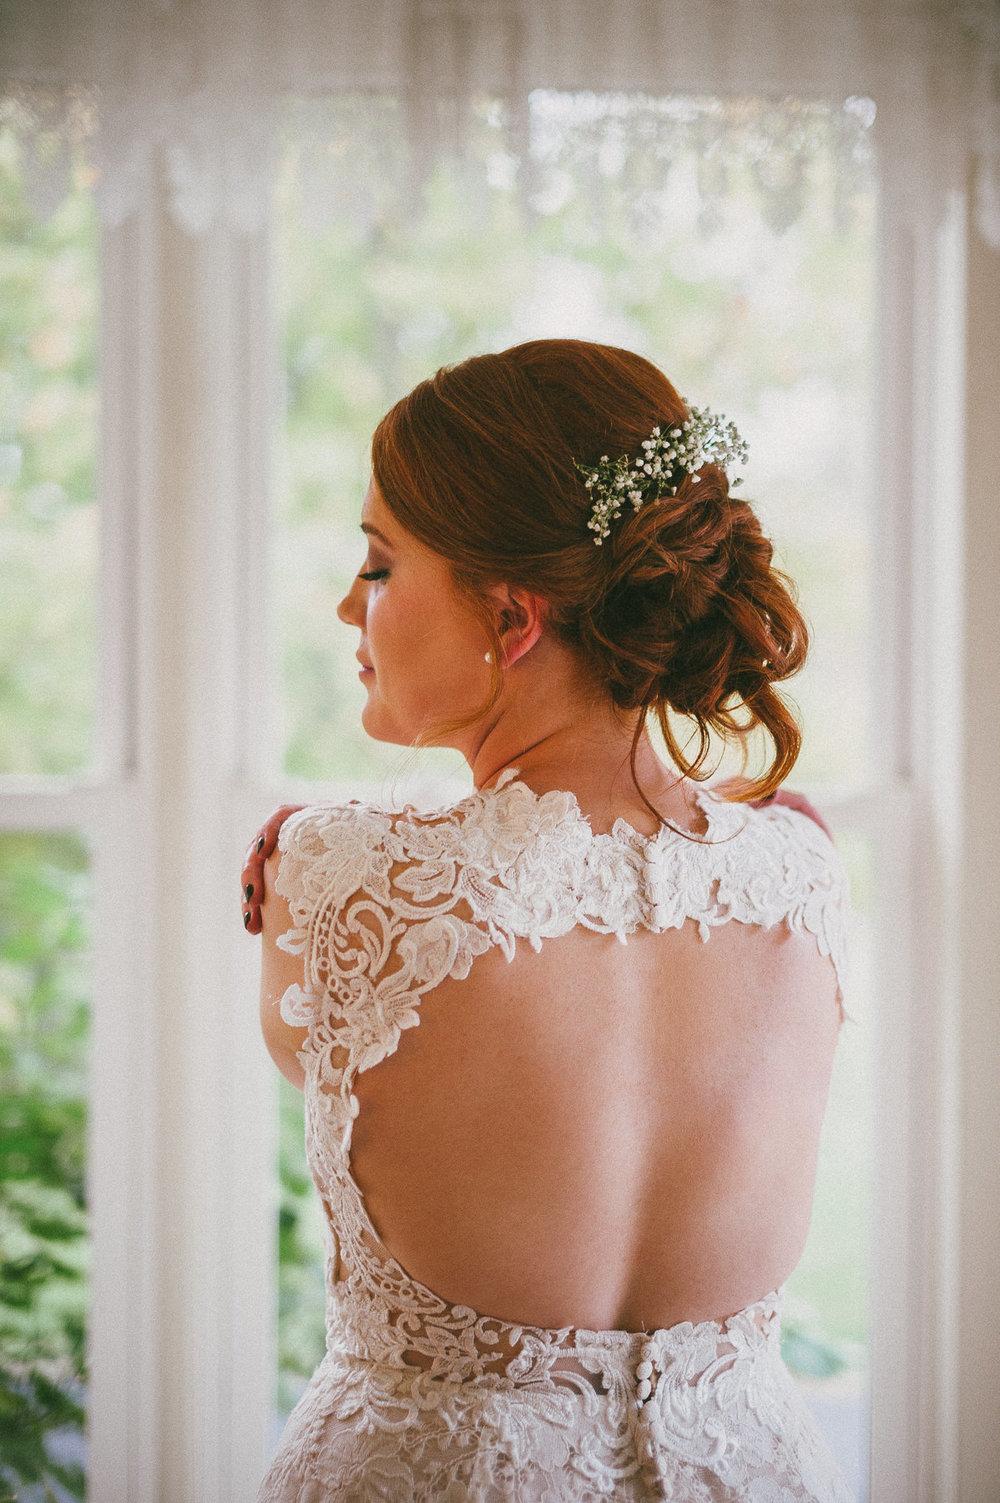 breighton-and-basette-photography-copyrighted-image-blog-amanda-and-eric-wedding-056.jpg